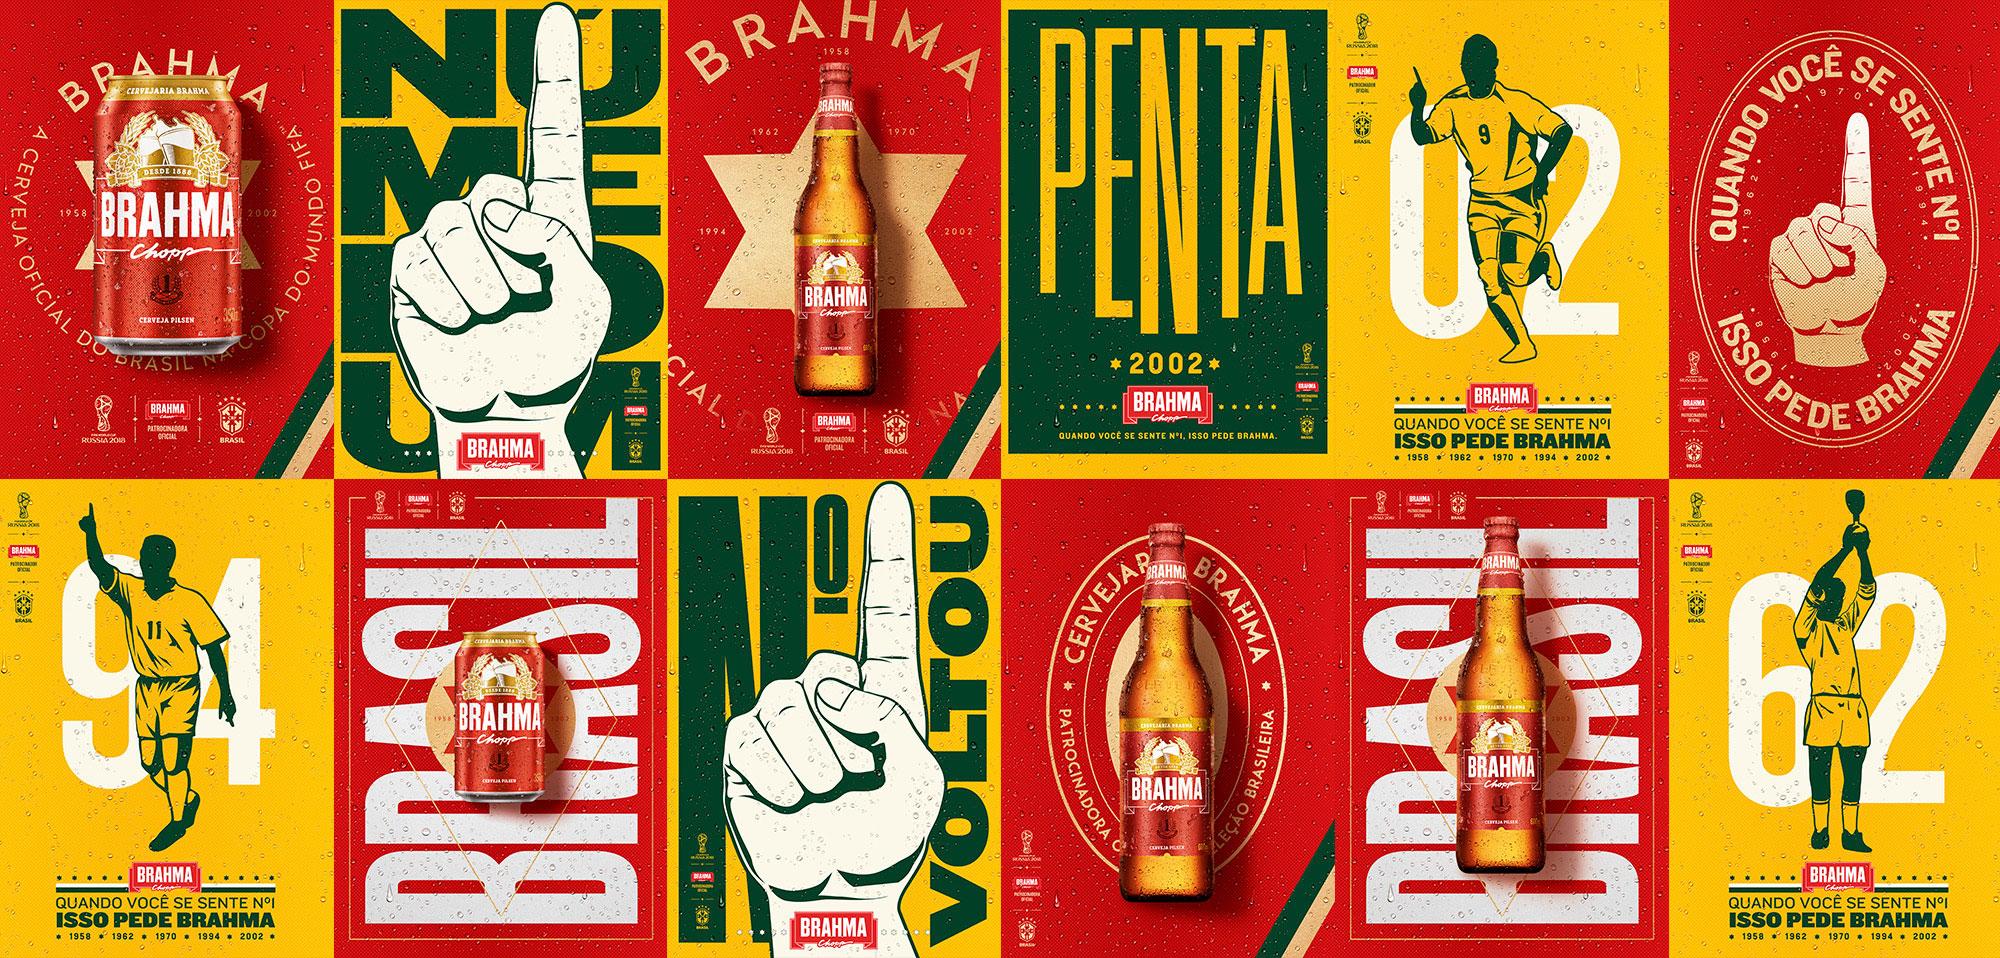 Brewery Brahma – World Cup 2018